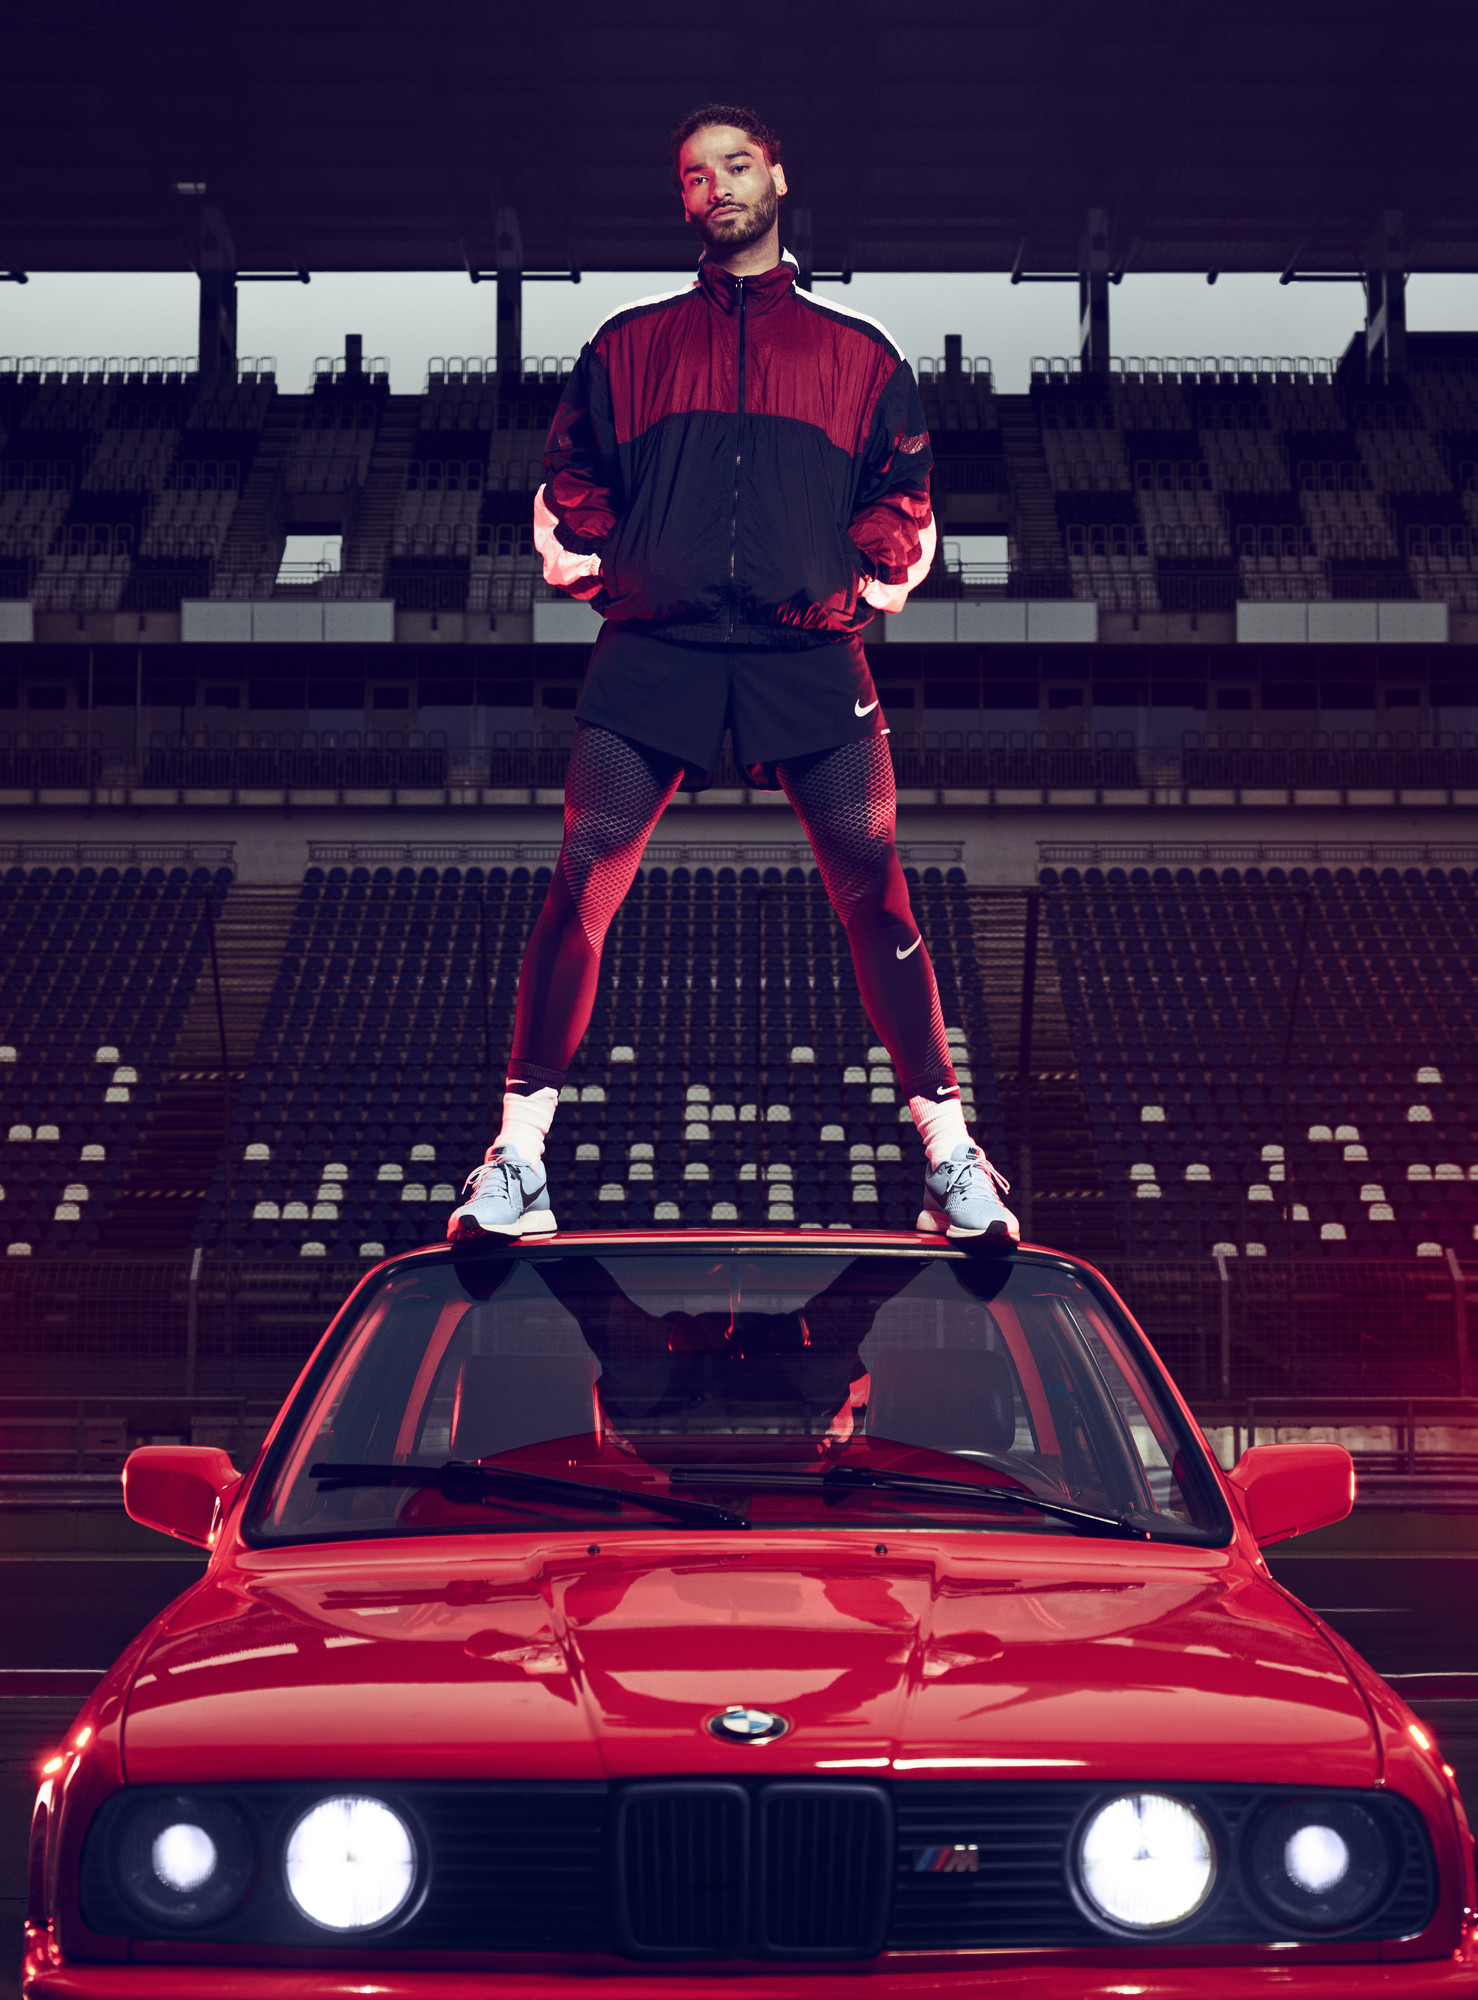 Berlin Braves x Nike Pegasus